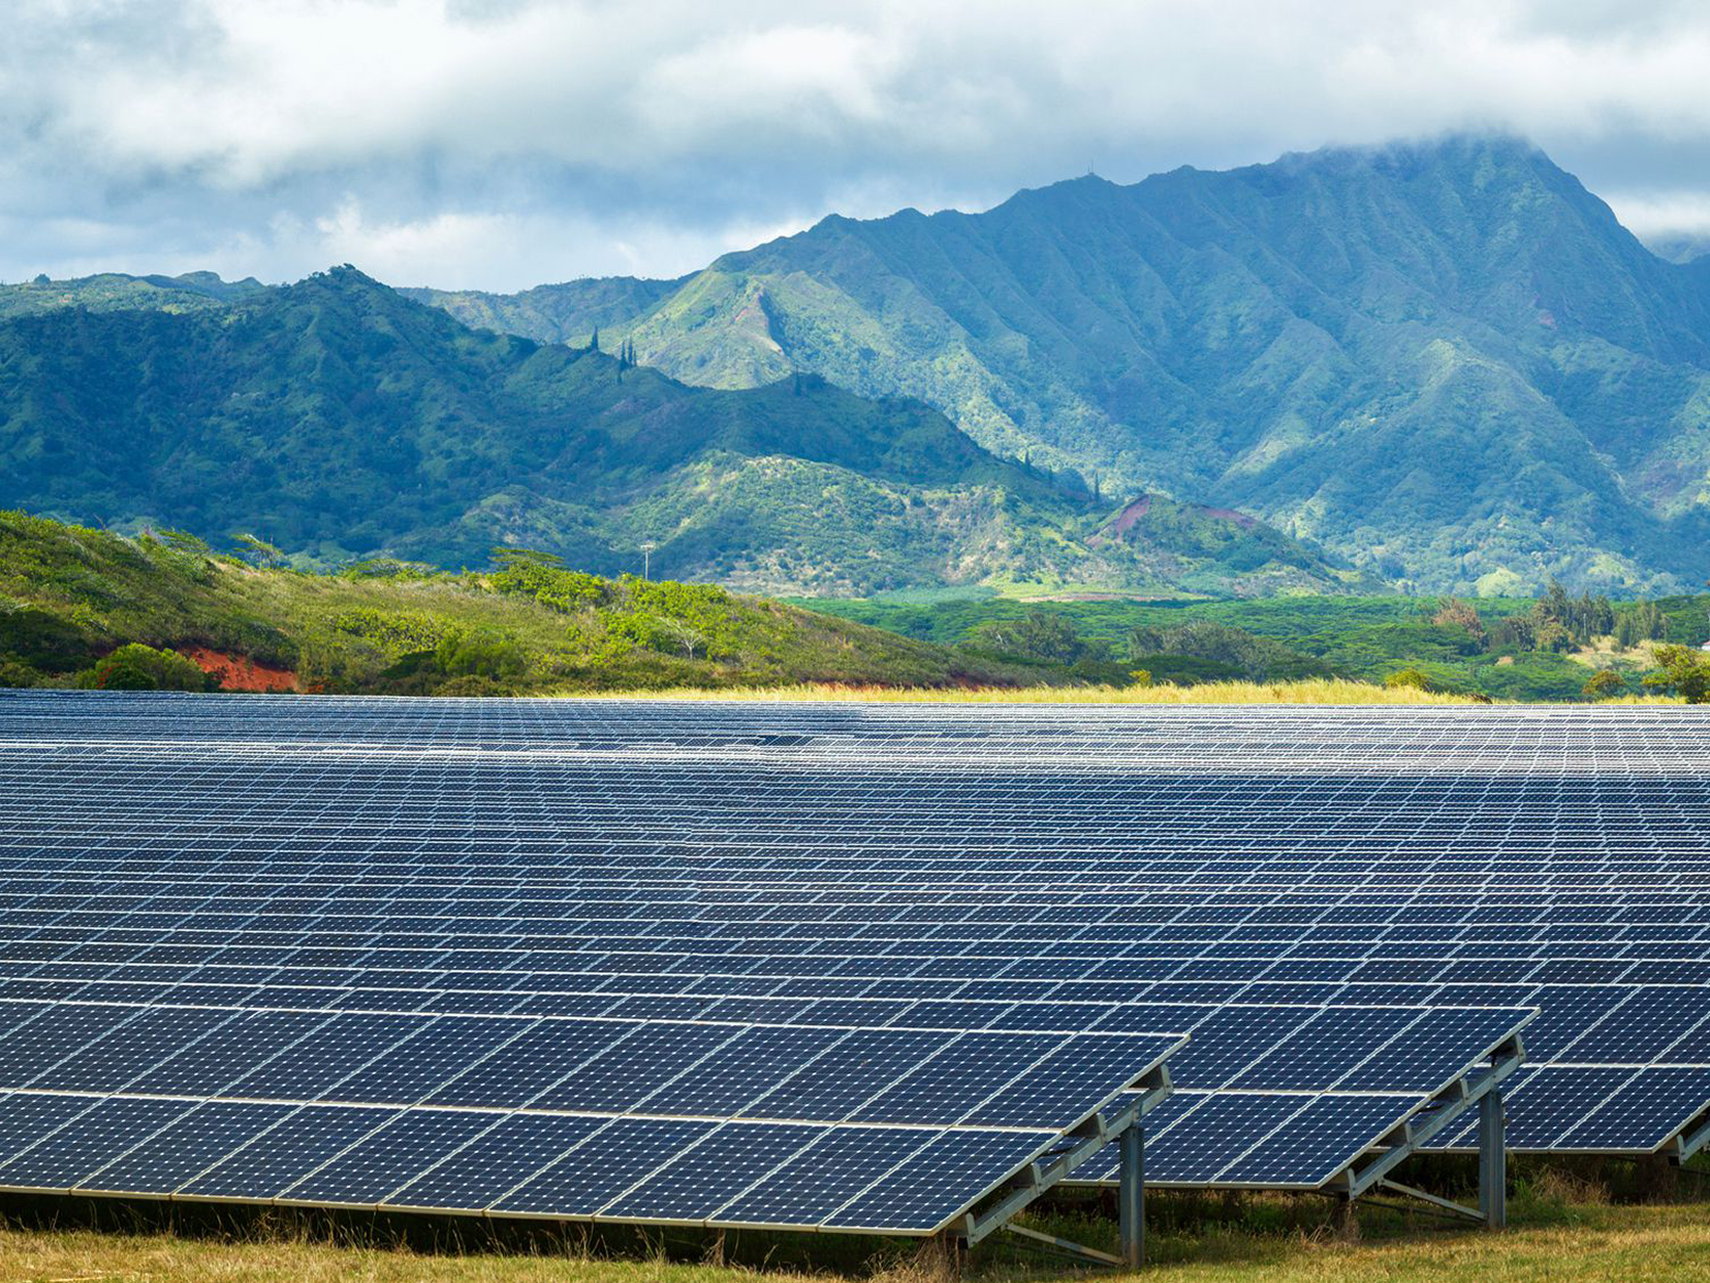 Photo: Solomon Power Plant in Poipu, Kauai, Hawaii, USA.